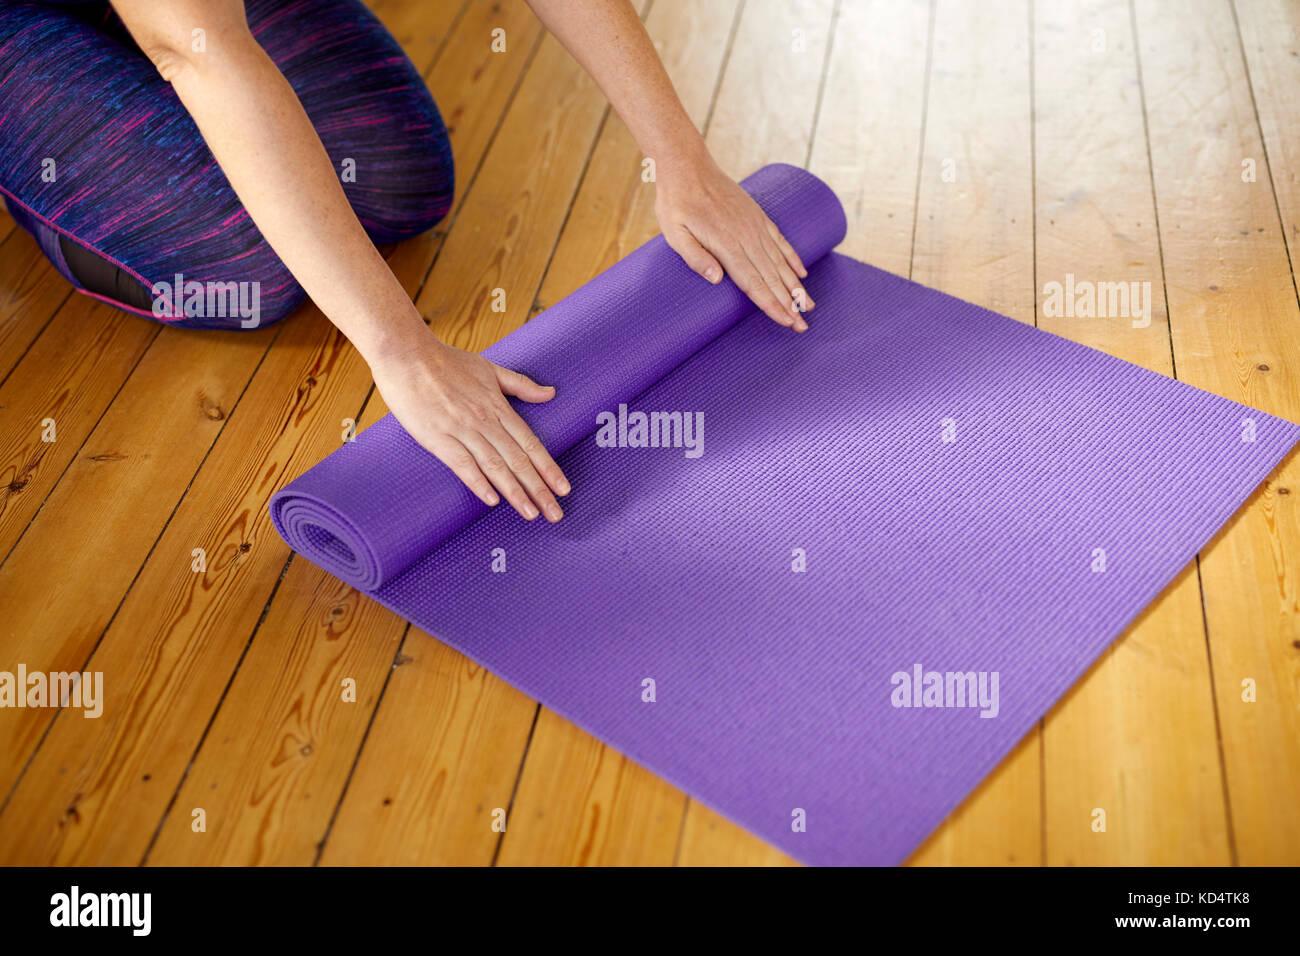 Yoga Mat - Stock Image